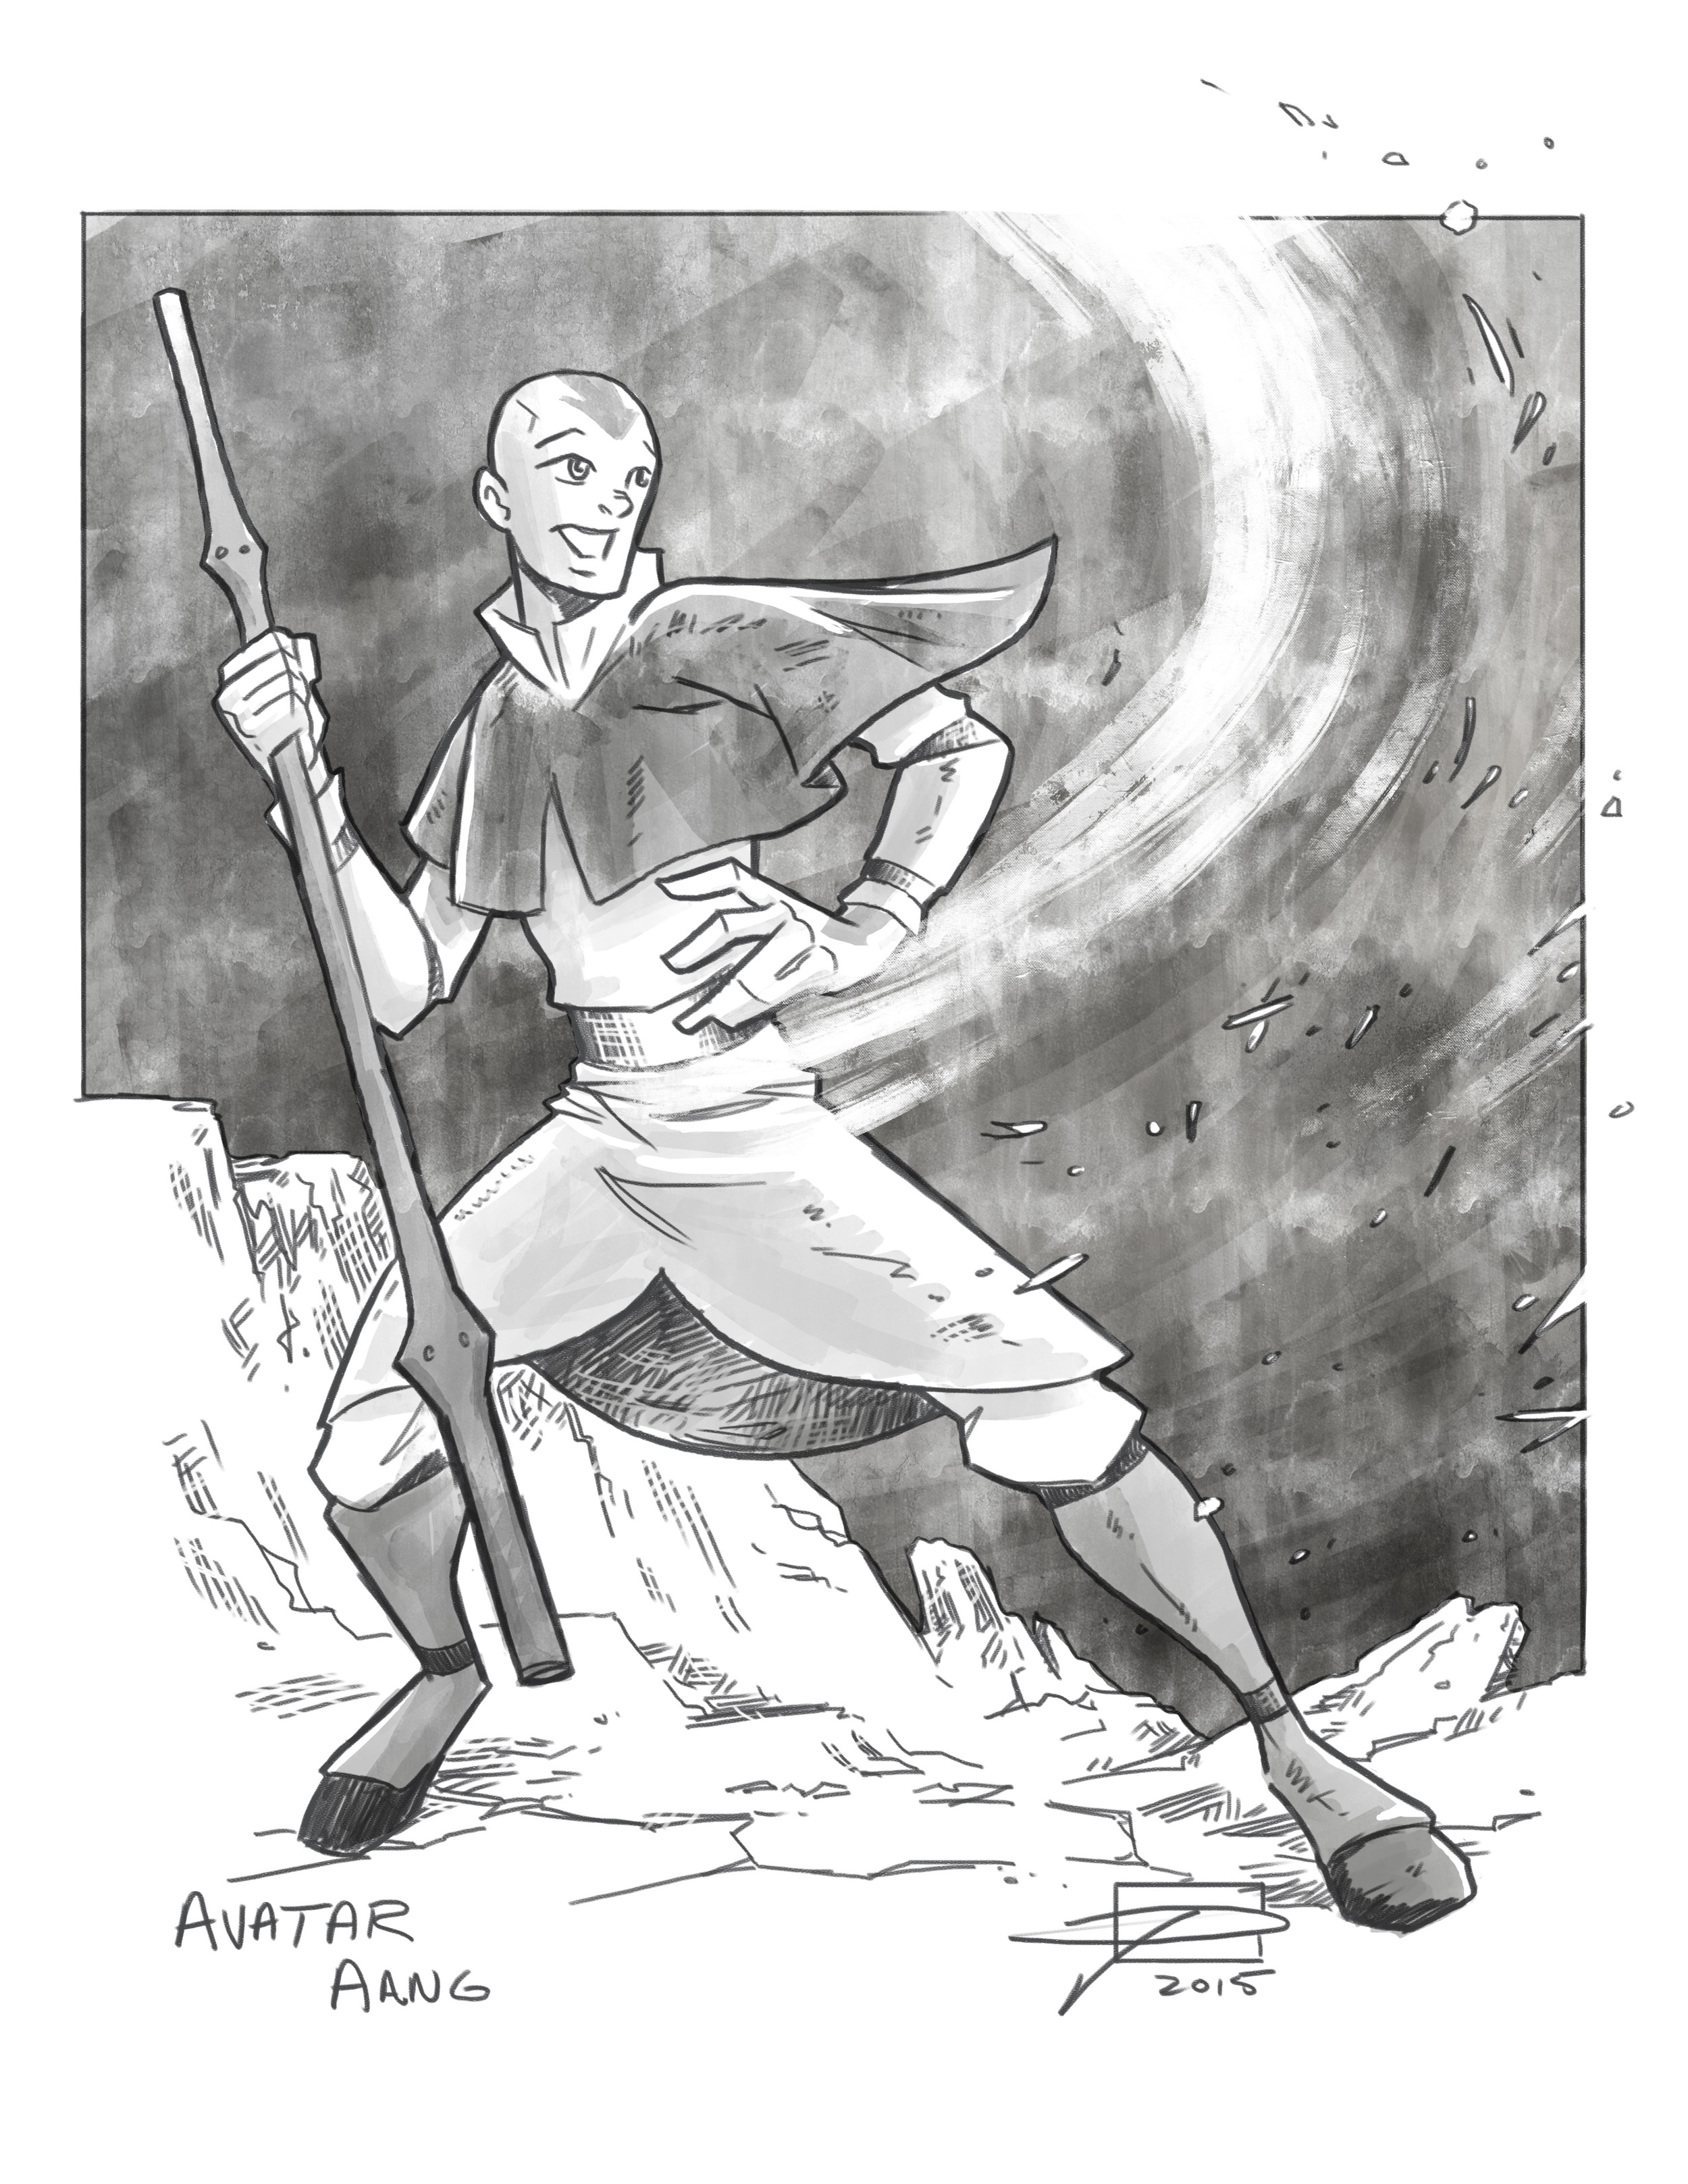 Avatar Aang.jpg